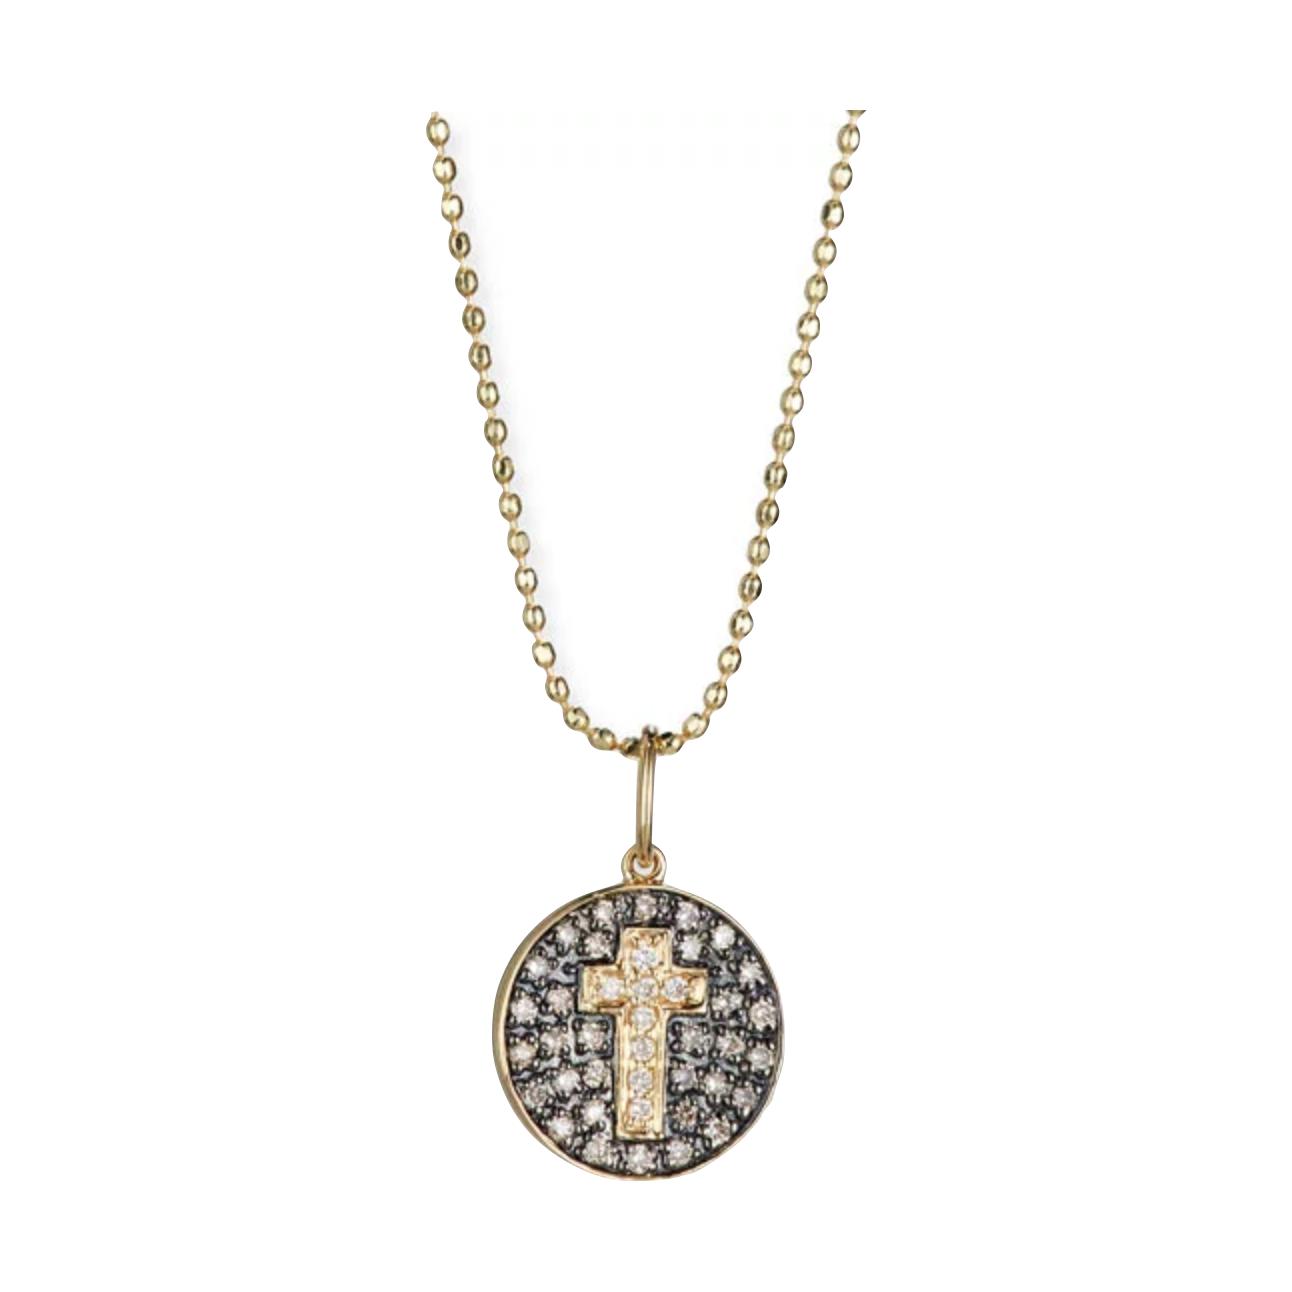 Sydney Evan's cross medallion necklace